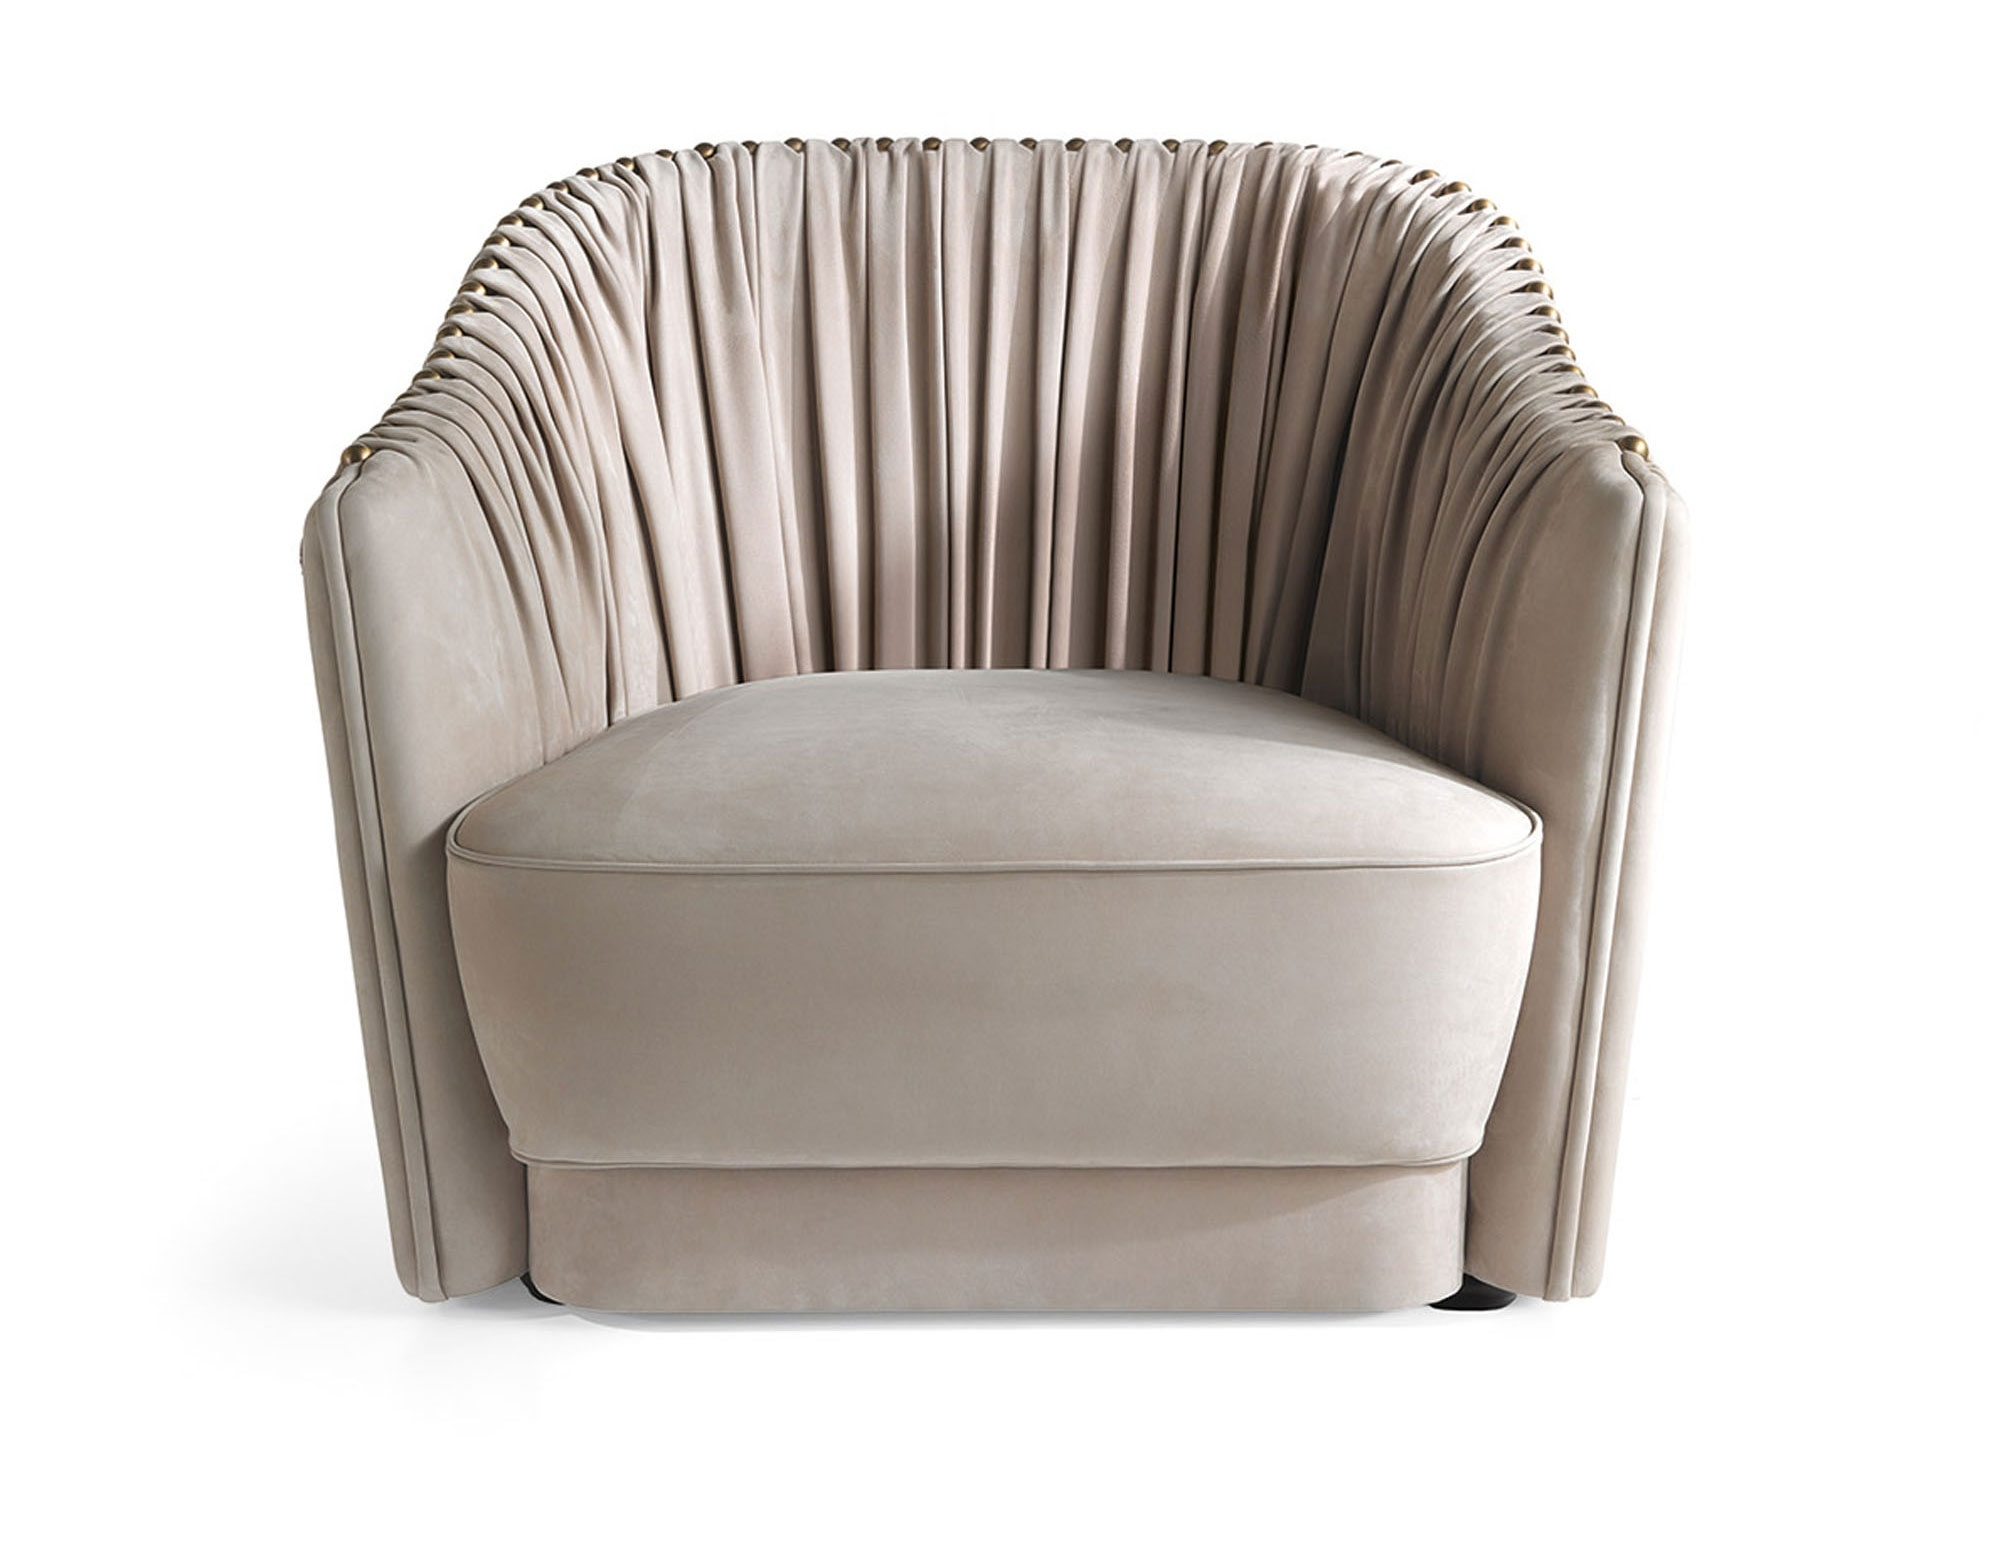 Popular Sofas And Chairs Intended For Nella Vetrina Sharpei Roberto Cavalli Home Modern Luxury Italian (View 19 of 20)